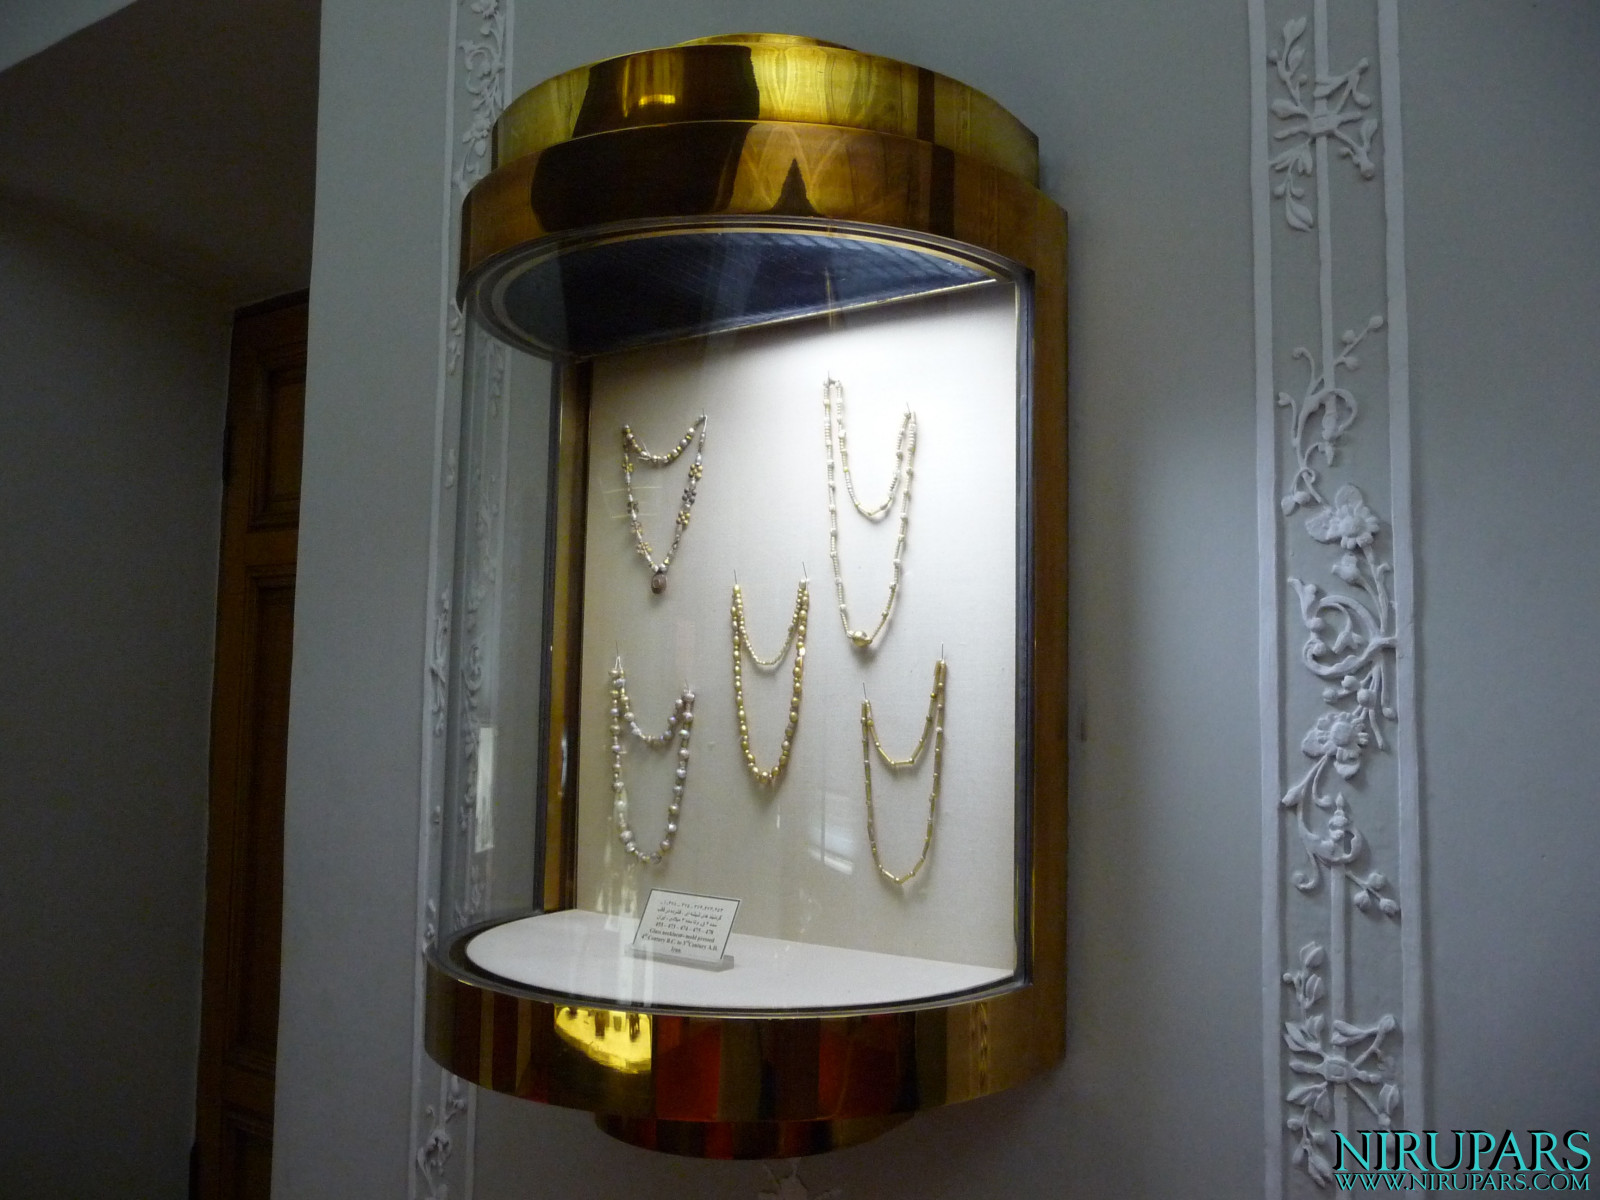 Glassware and Ceramic Museum - Necklaces Glass